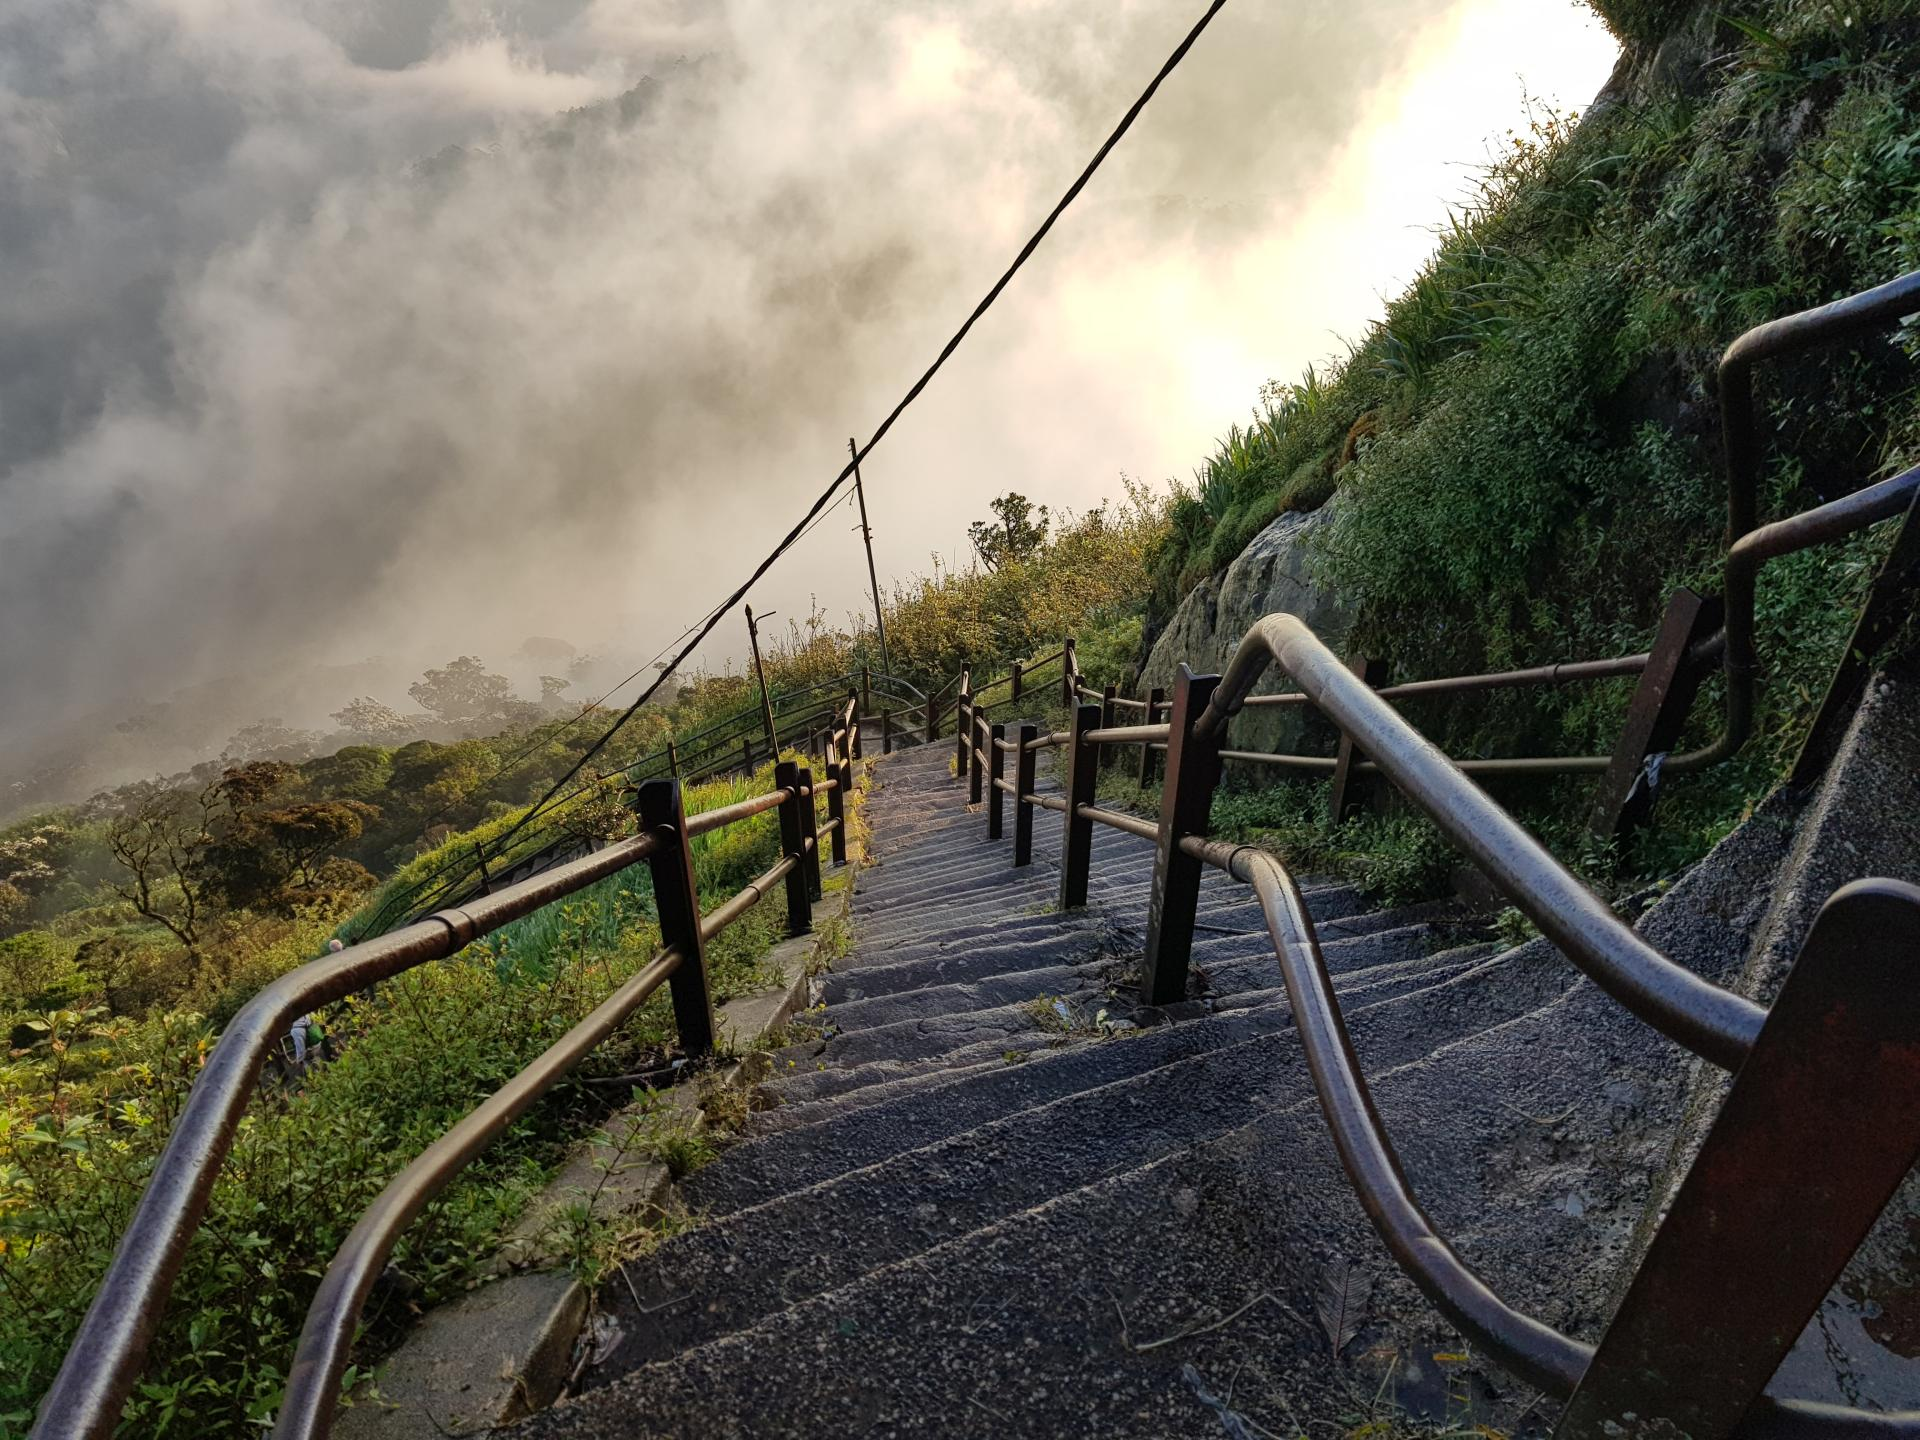 Лестница в облака, пик Адама, Шри-Ланка.